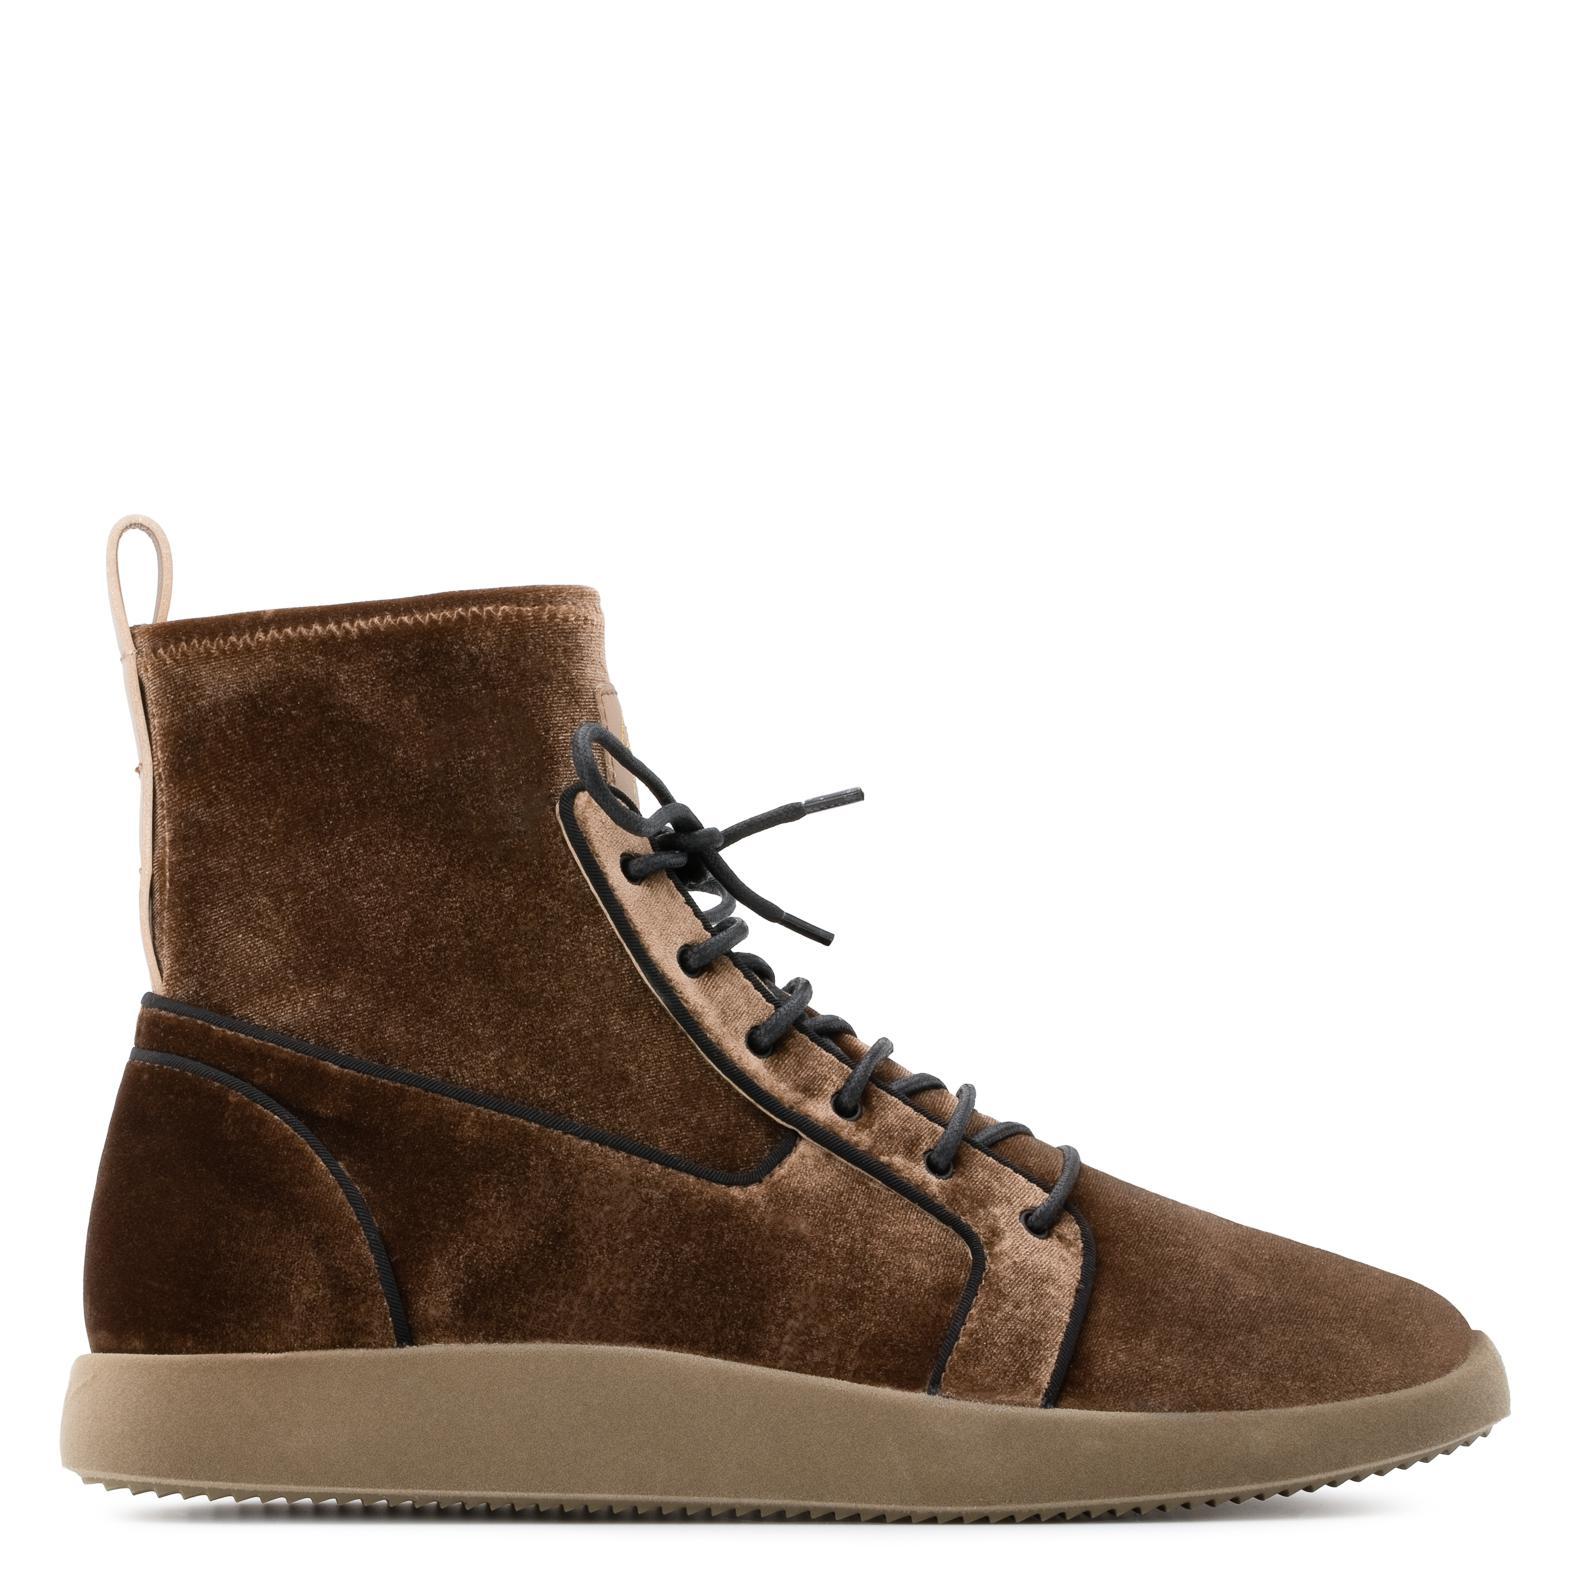 Giuseppe Zanotti Brown velvet stretch high-top sneakers CESAR w8UIIB